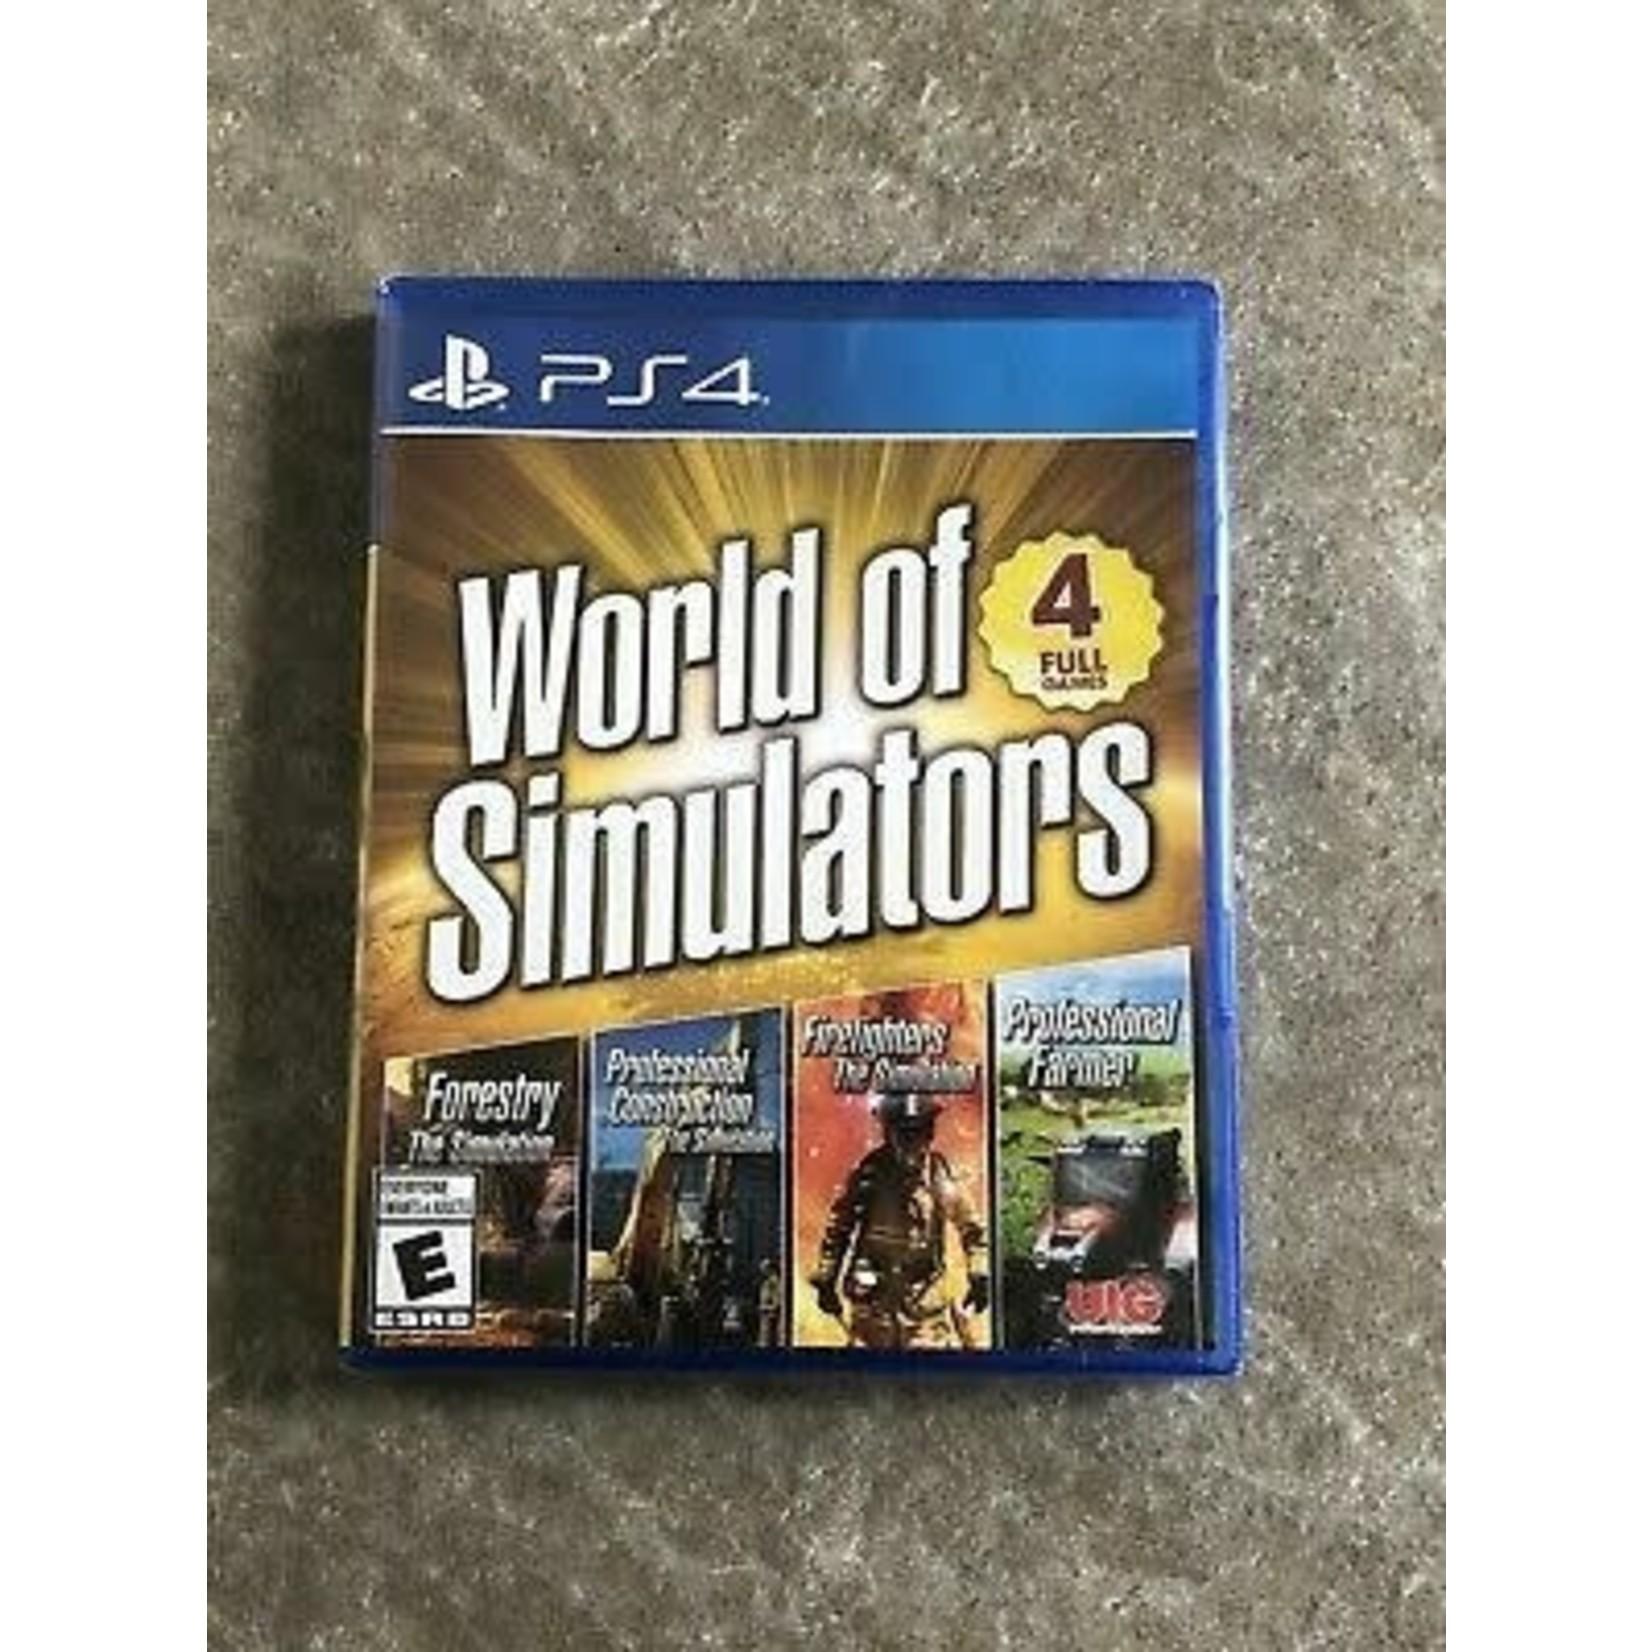 PS4-World Of Simulators